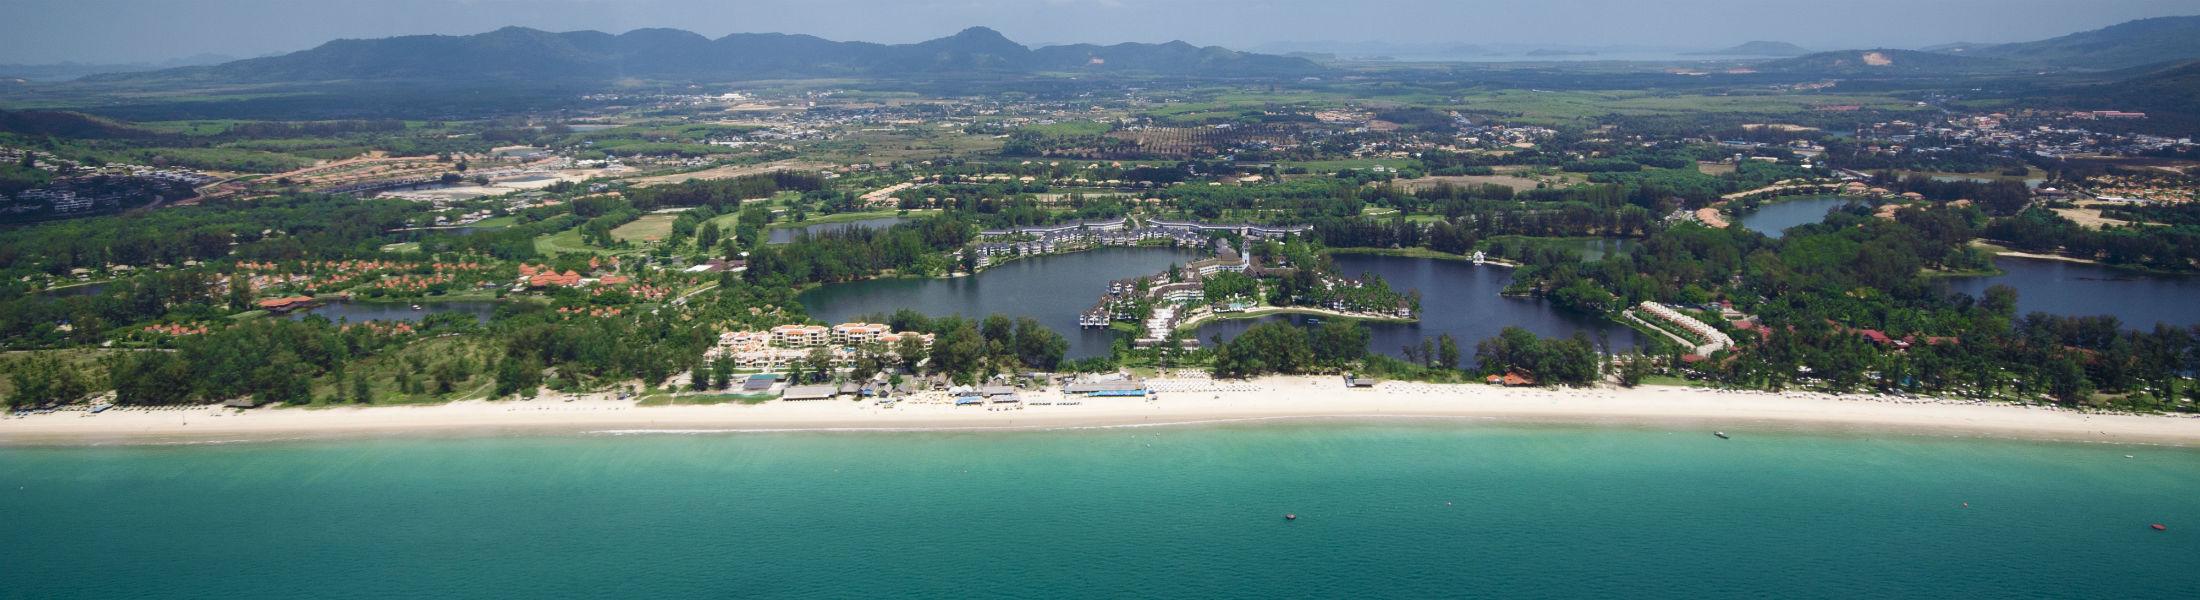 Laguna Main beach and overview